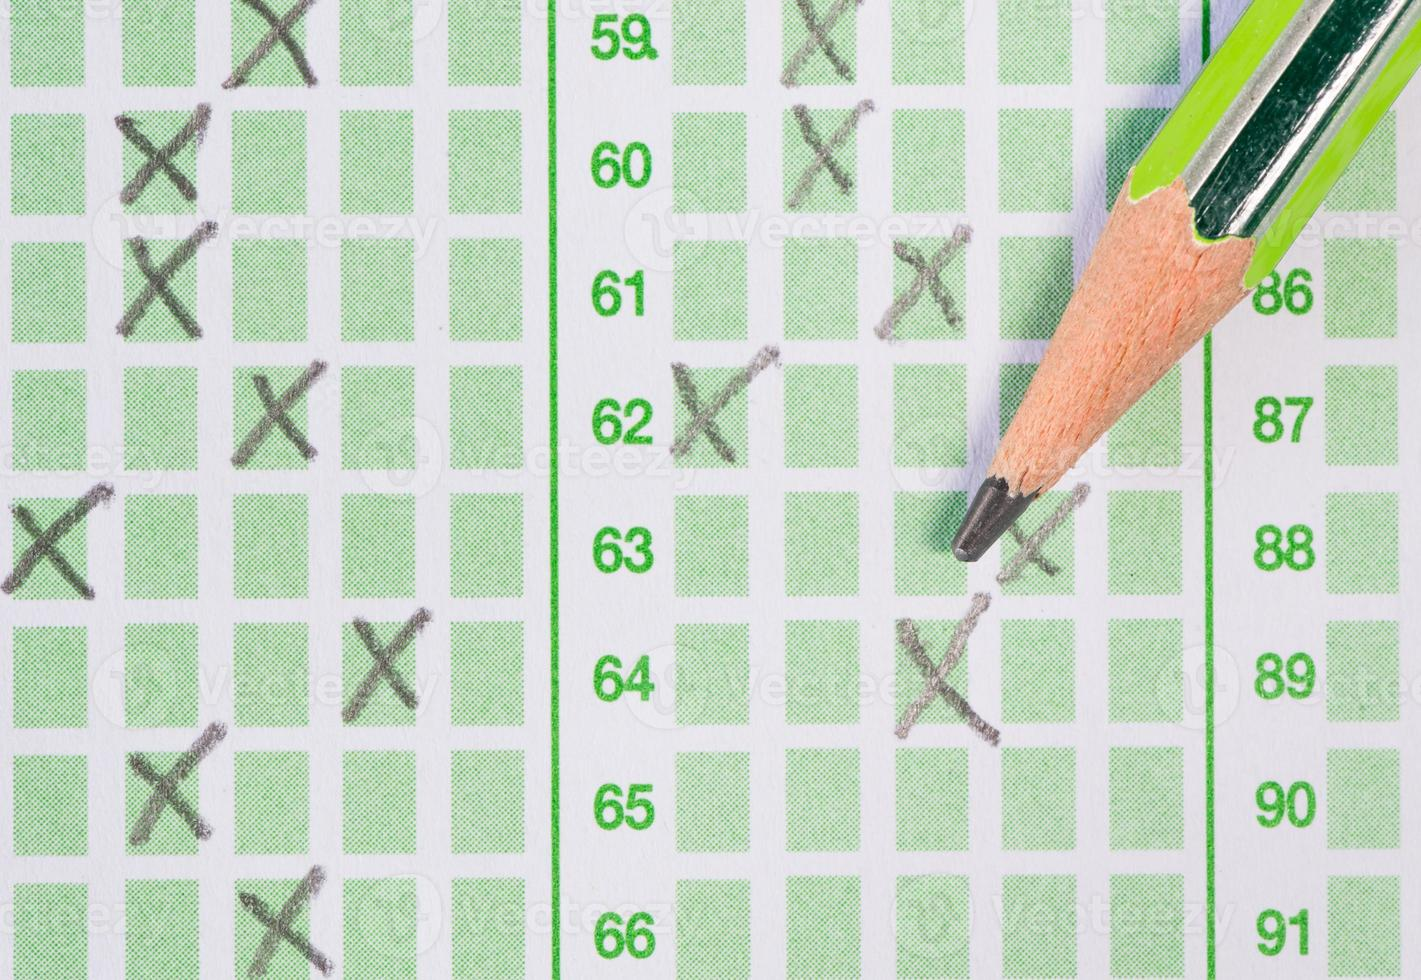 pencil on answer sheet photo